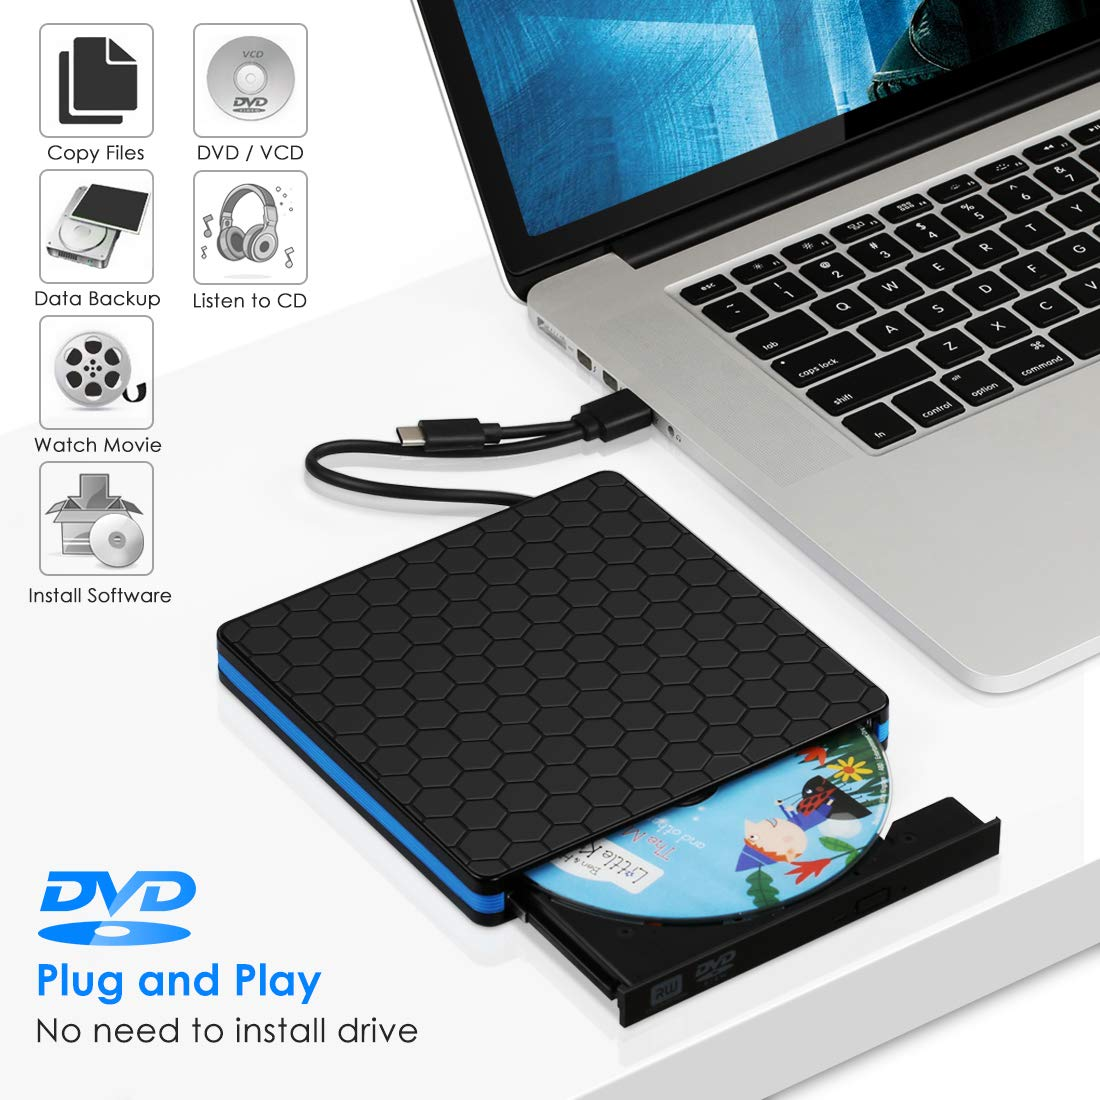 Kingbox External Hard Drive External DVD Drive Hard Disk USB 3 0 Type-C  CD/DVD Writer Drive for Laptop Desktop PC Computer Windows Linux OS Apple  Mac